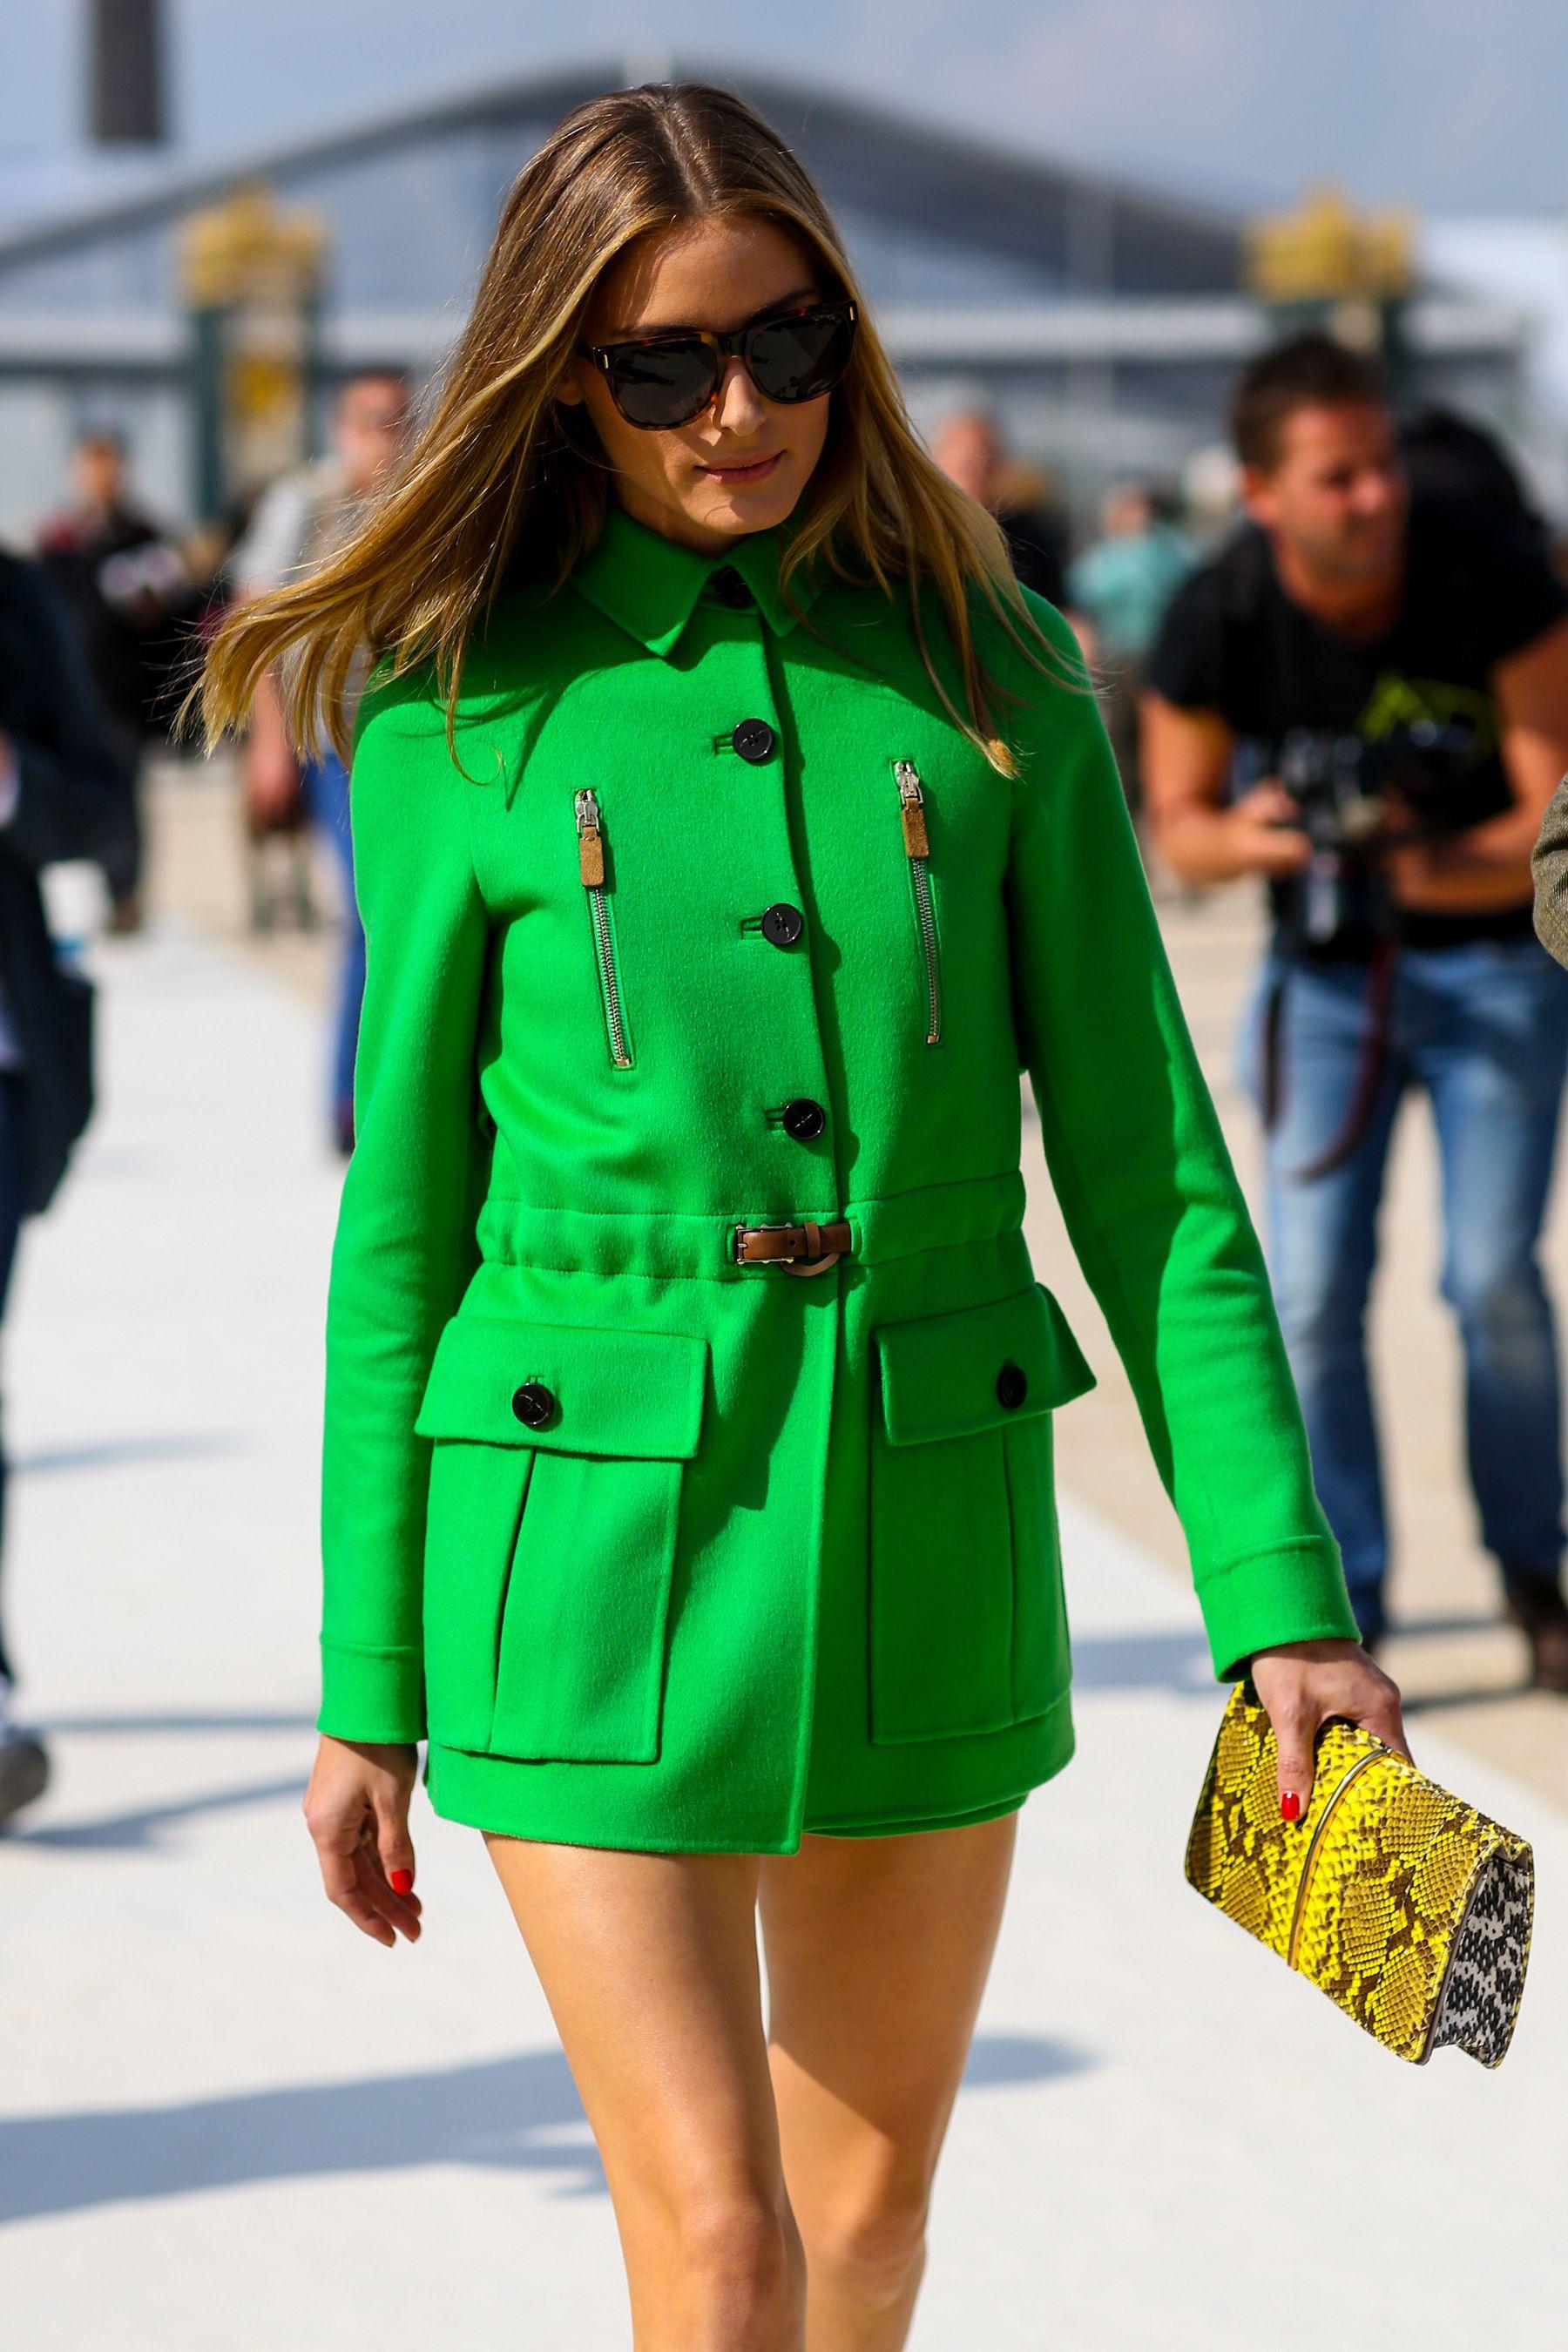 Paris FW SS15 Street Style: Olivia Palermo and Nausheen